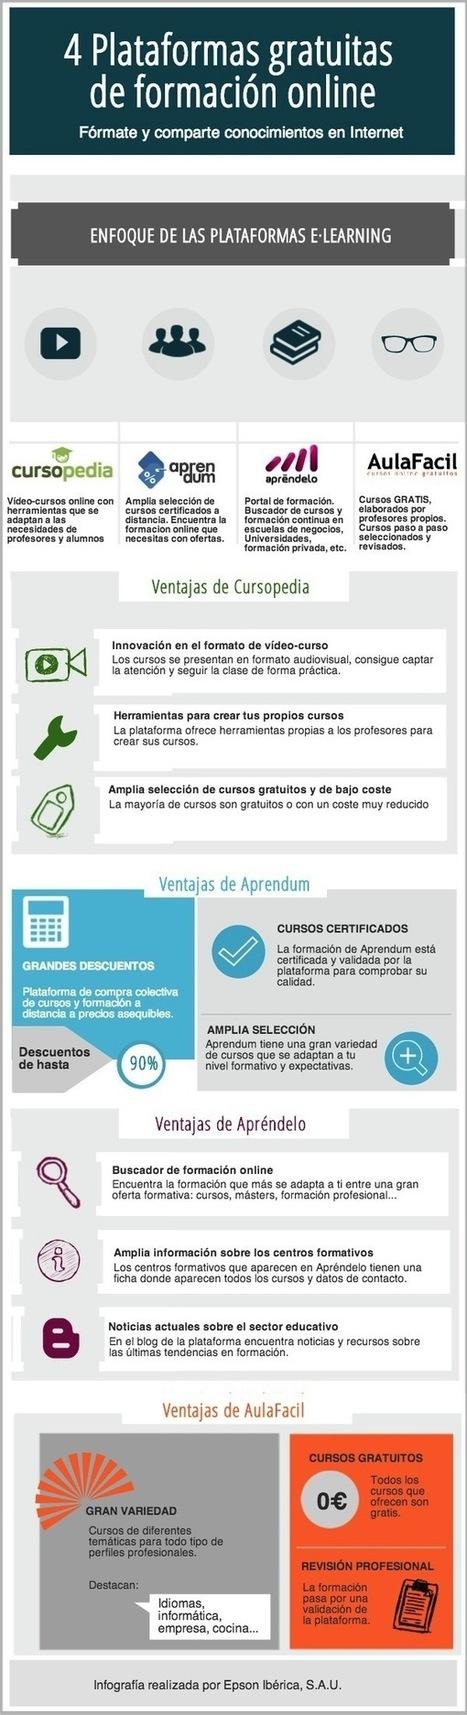 4 plataformas gratuitas de formación online #infografia #infographic ...   Linguagem Virtual   Scoop.it